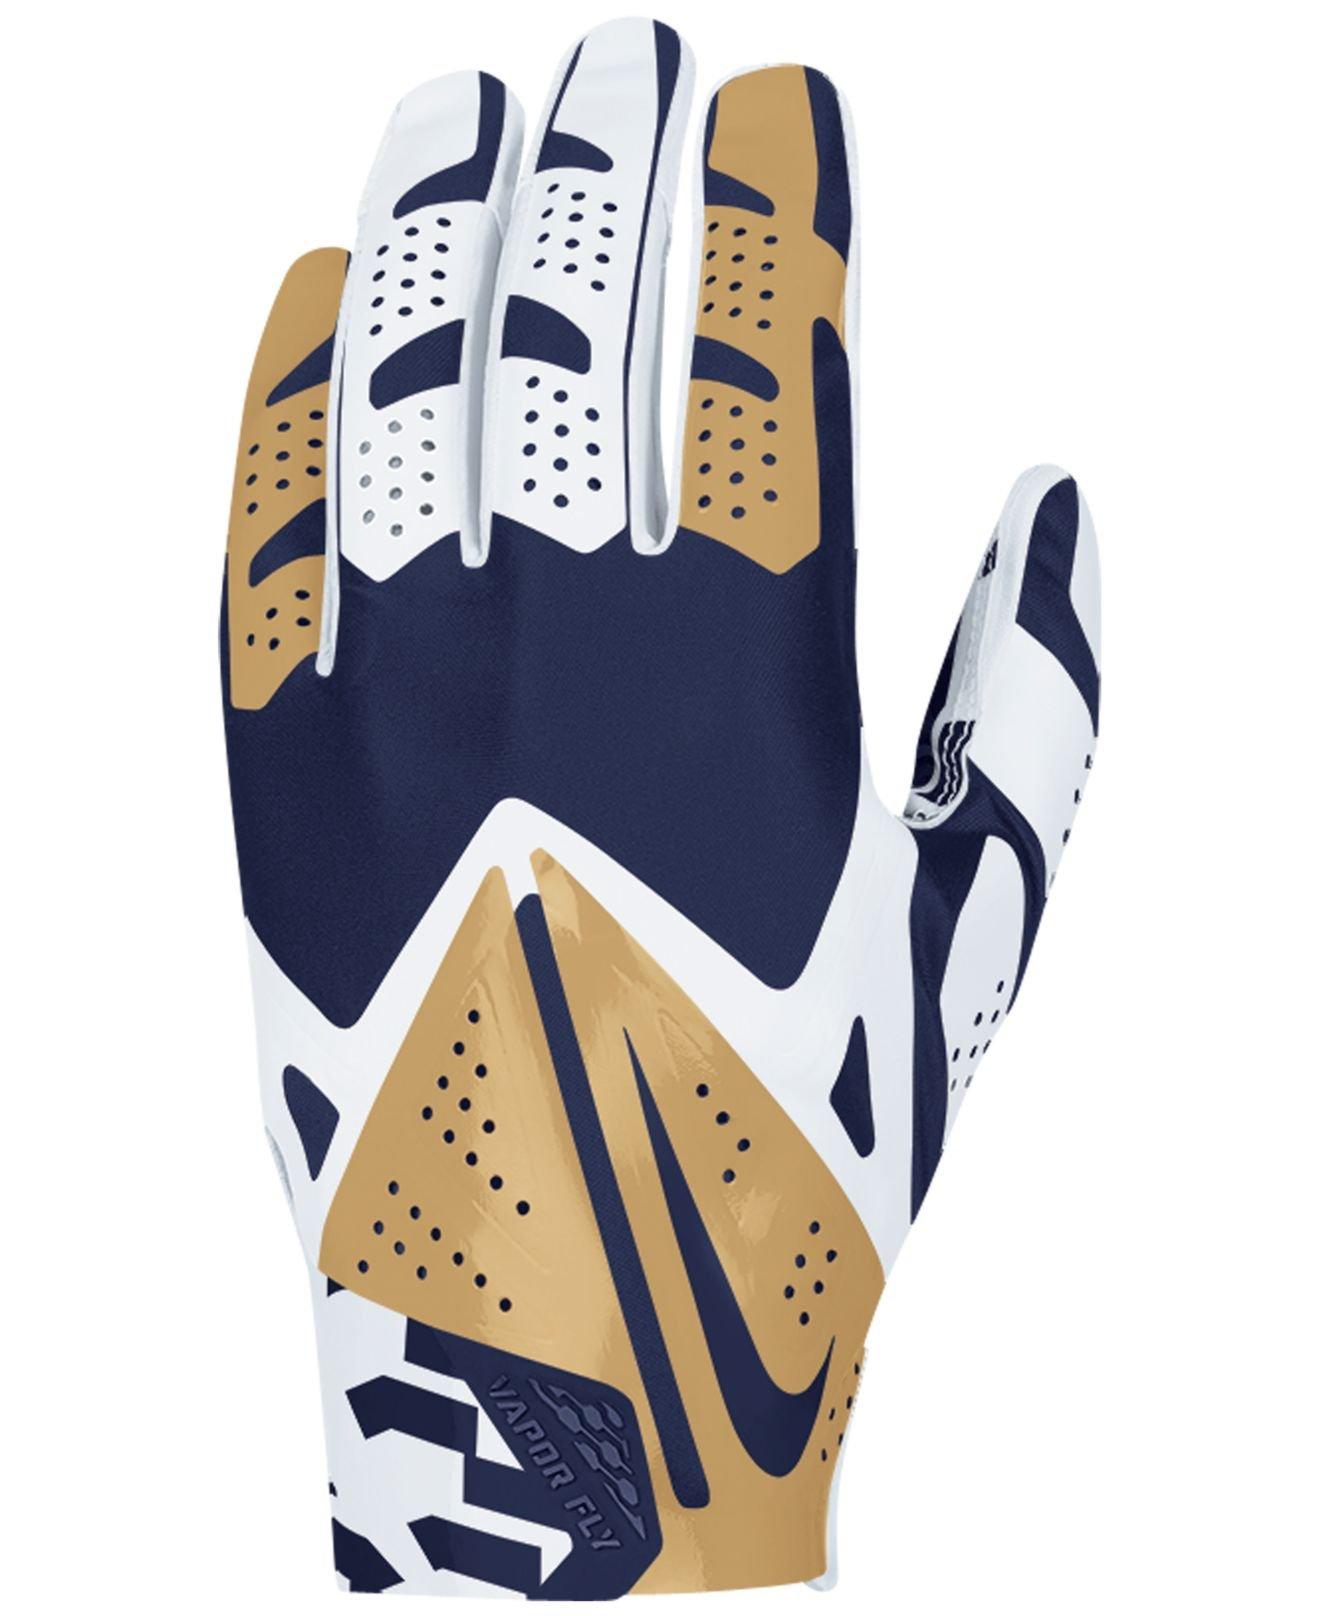 lyst nike st louis rams vapor fly team authentic glove